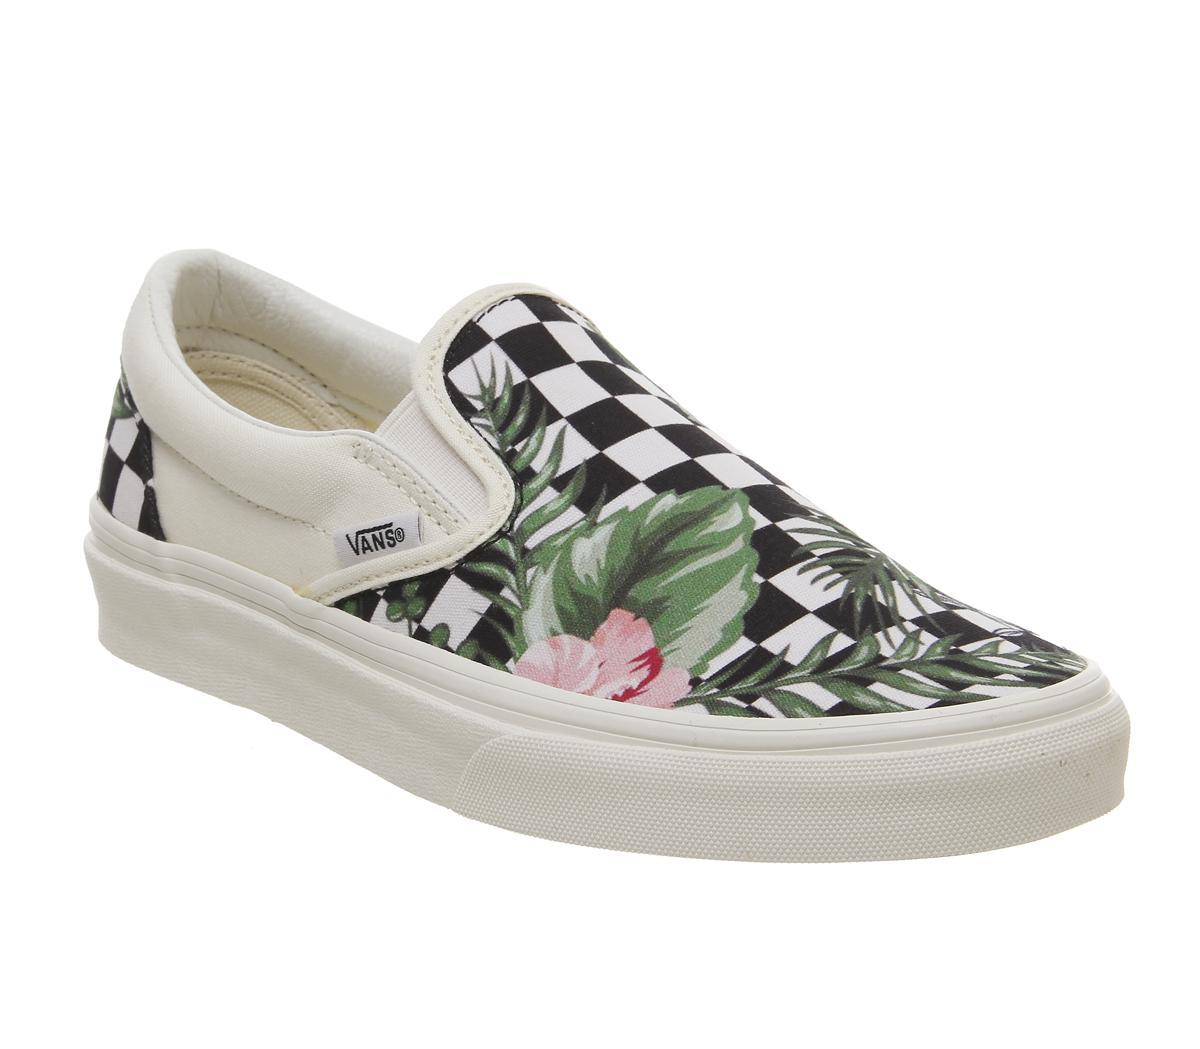 Vans Classic Slip On Checkboard | spedizioni | adidas yeezy